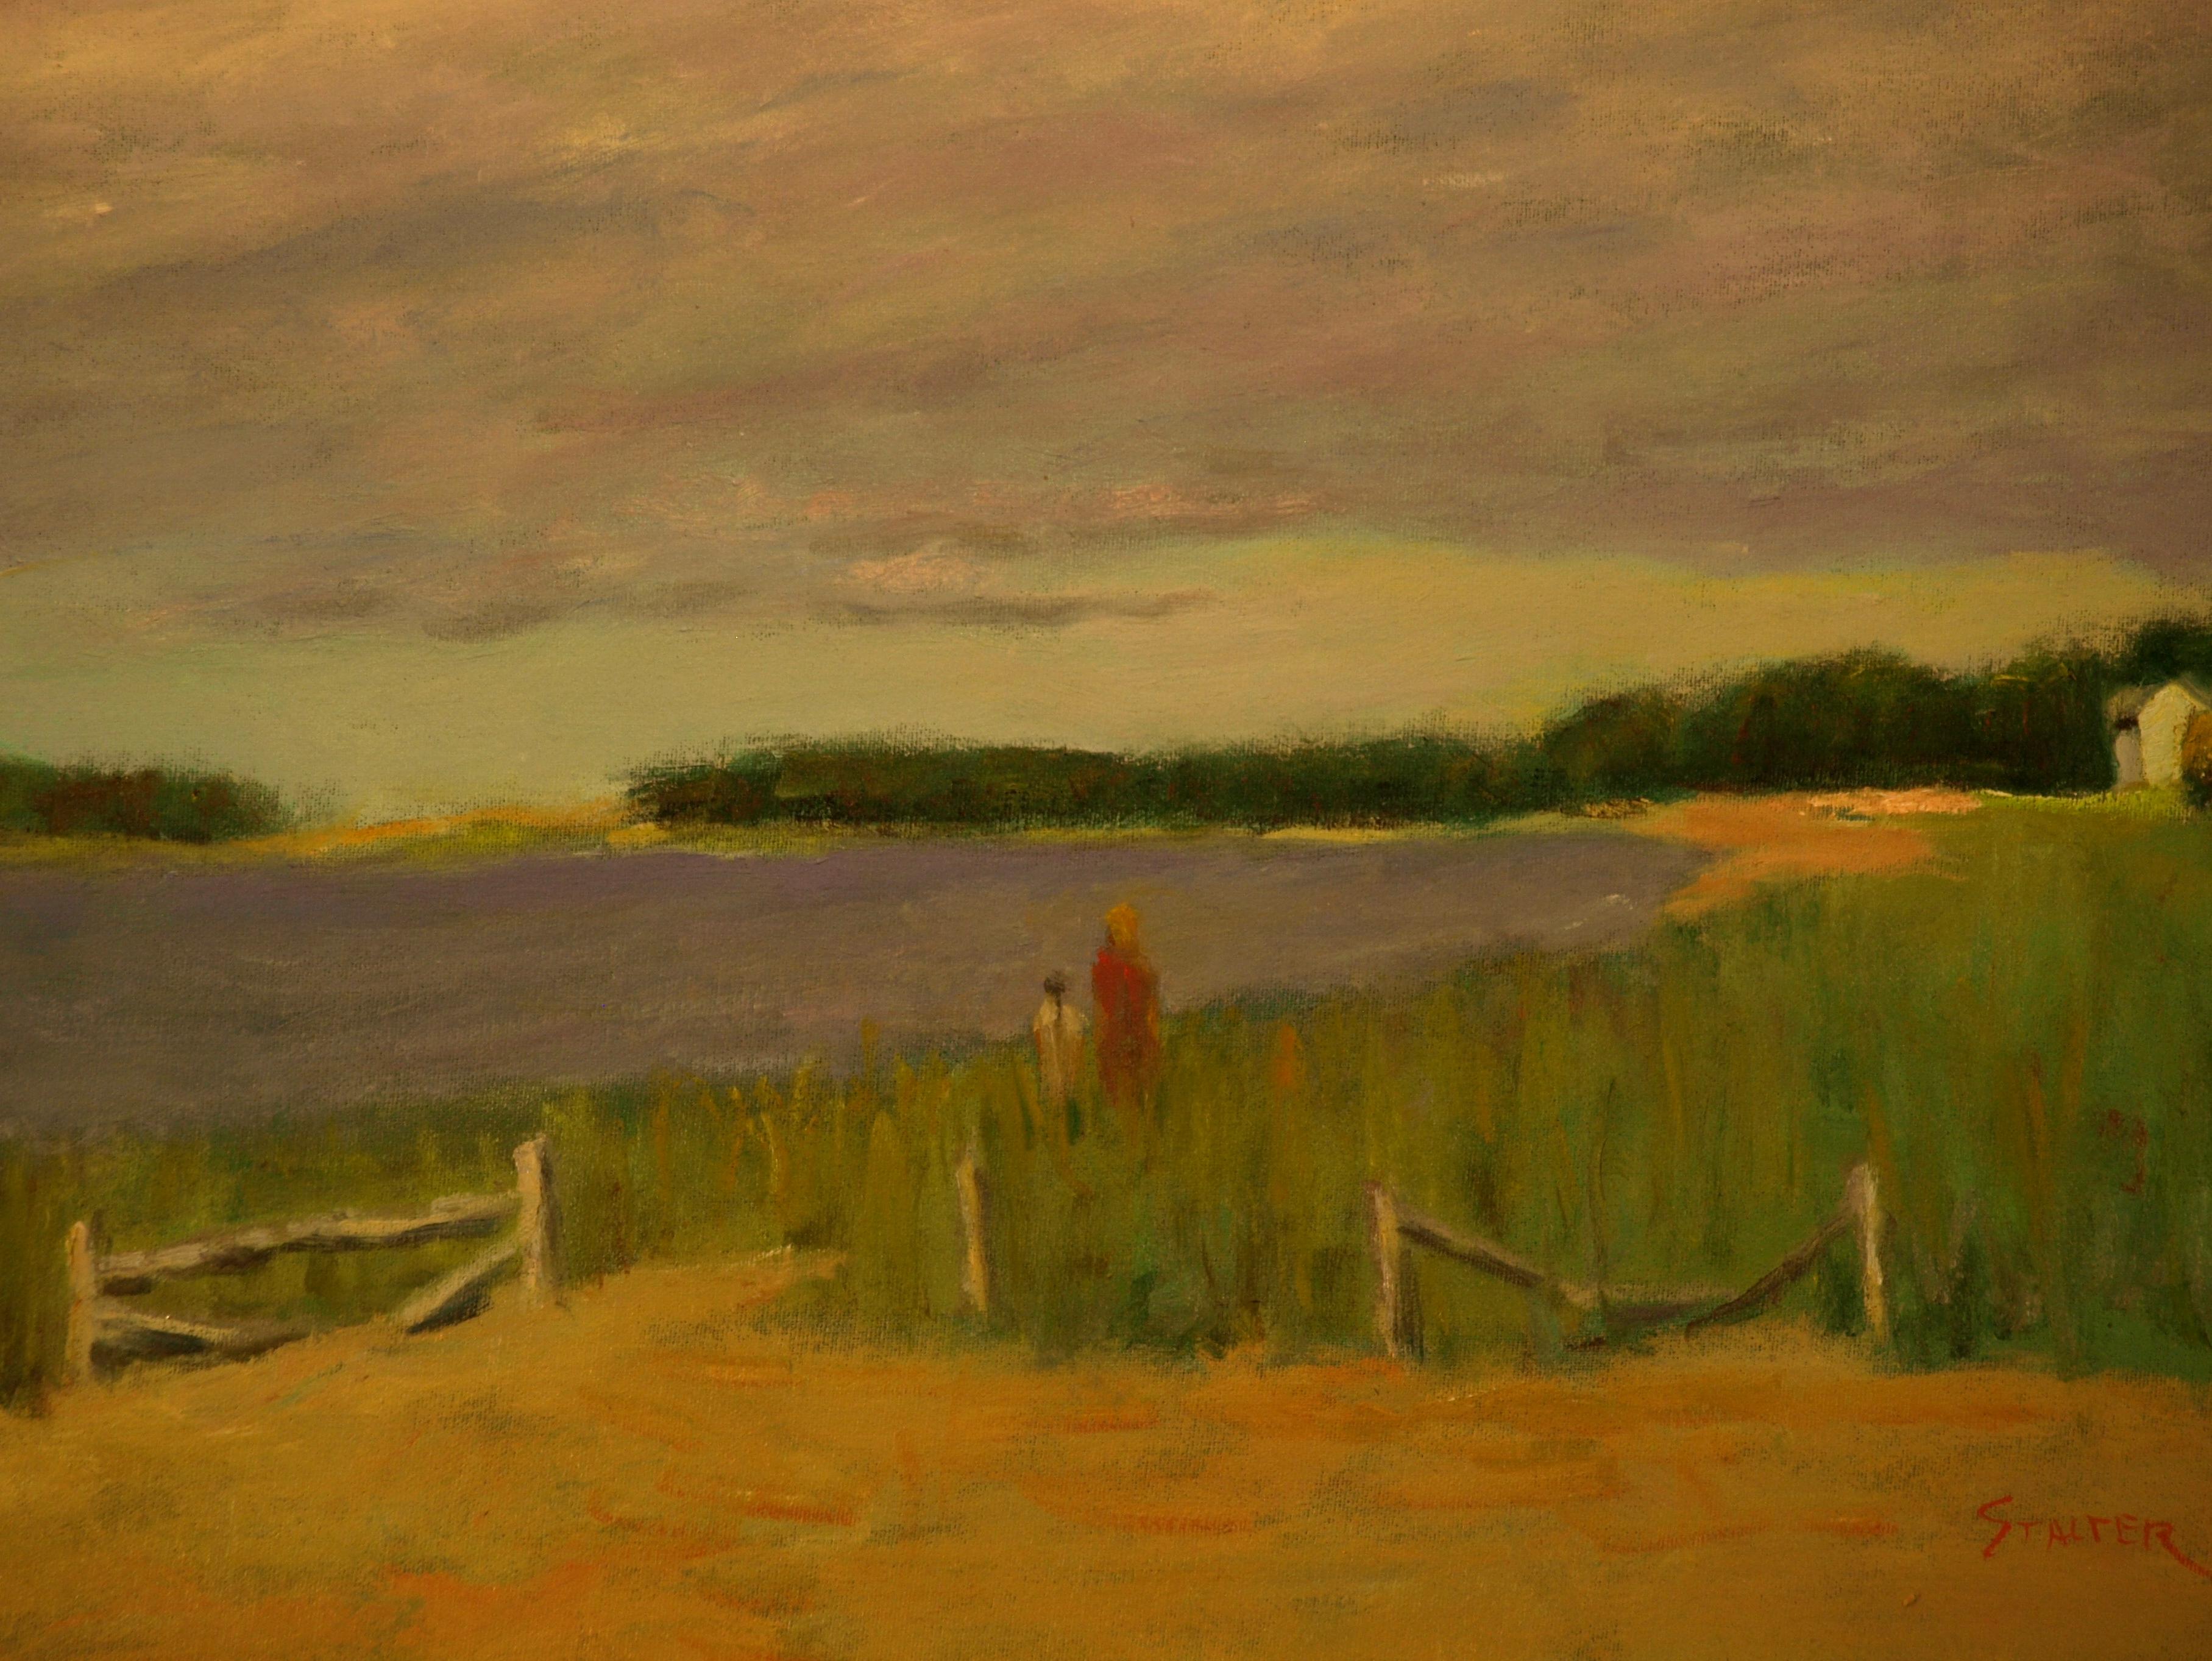 Overcast -- Wellfleet Beach, Oil on Canvas, 18 x 24 Inches, by Richard Stalter, $650